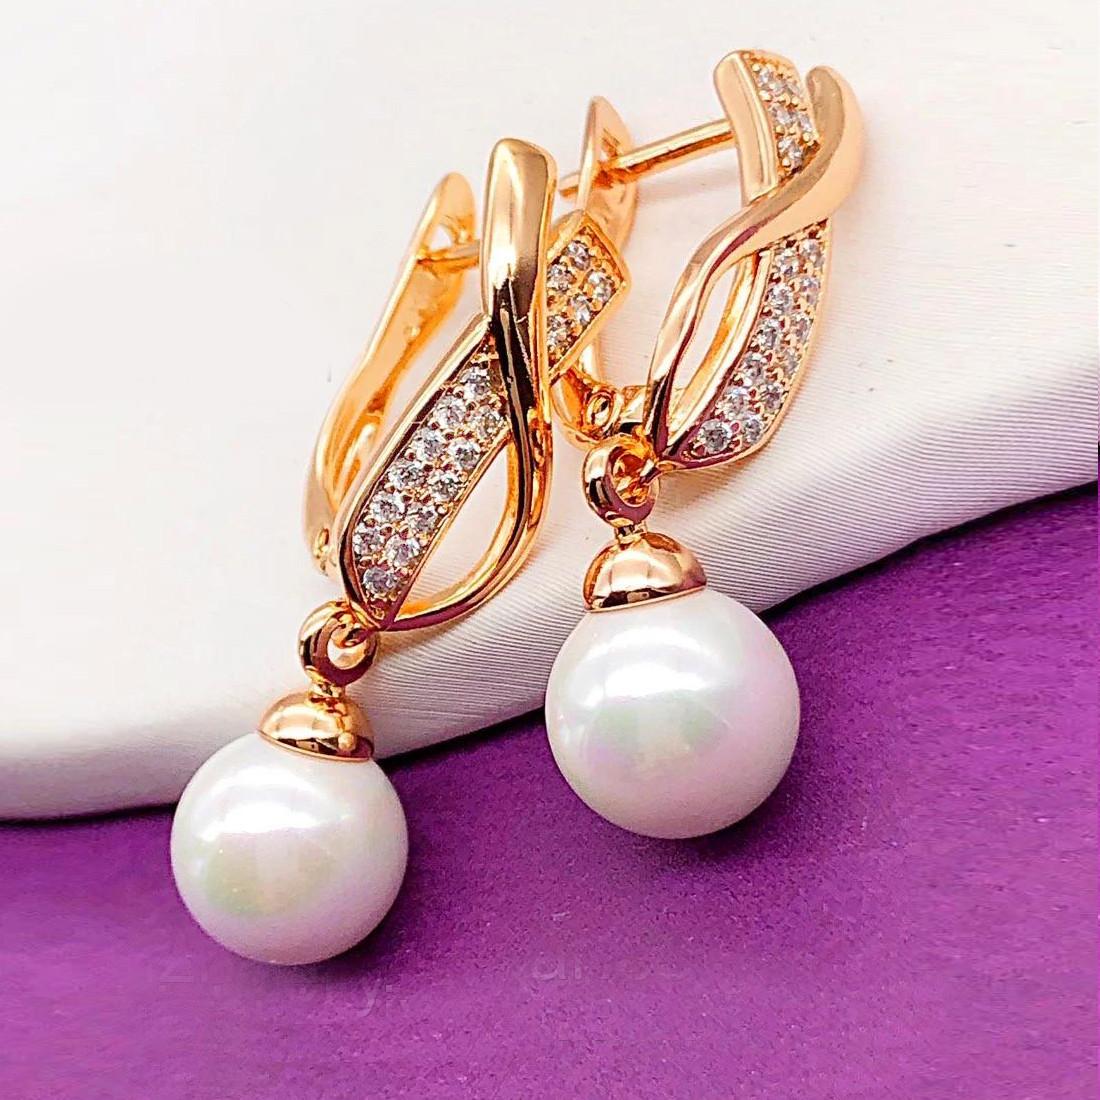 Сережки Xuping довжина 2.8см перли 8мм медичне золото позолота 18К  с1188